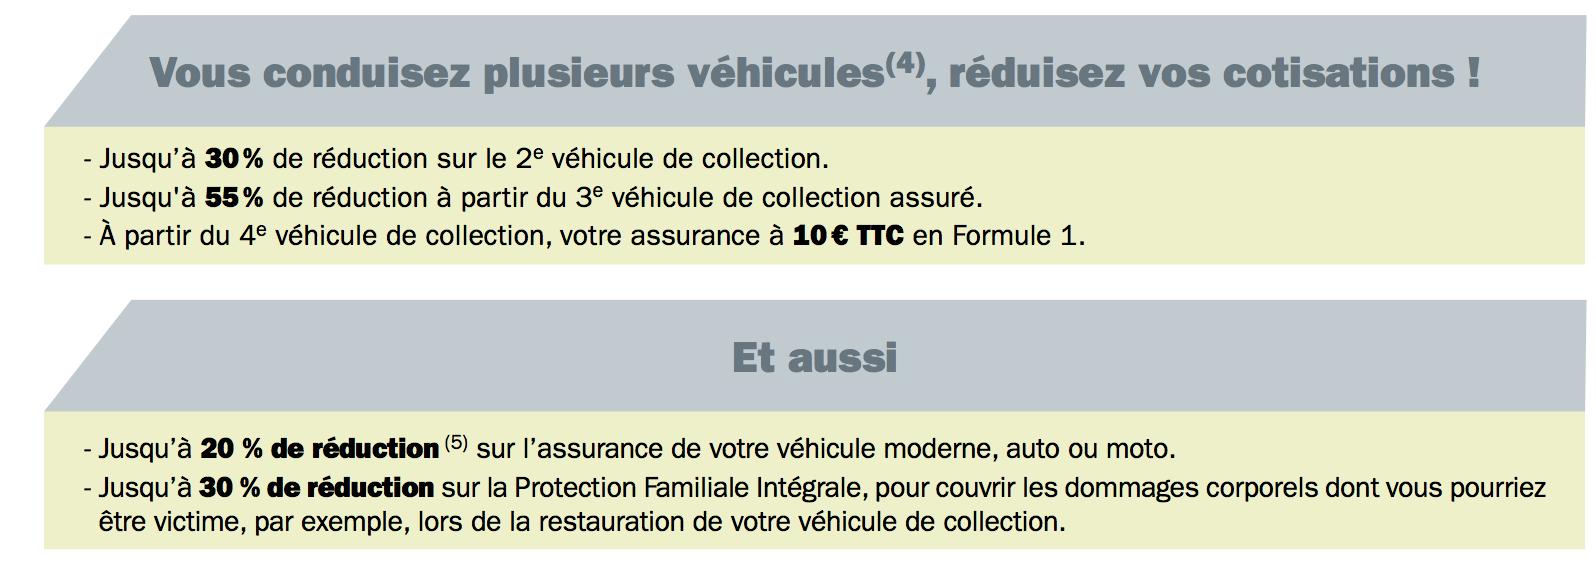 Avantages tarifaires AXA Véhicules de collections